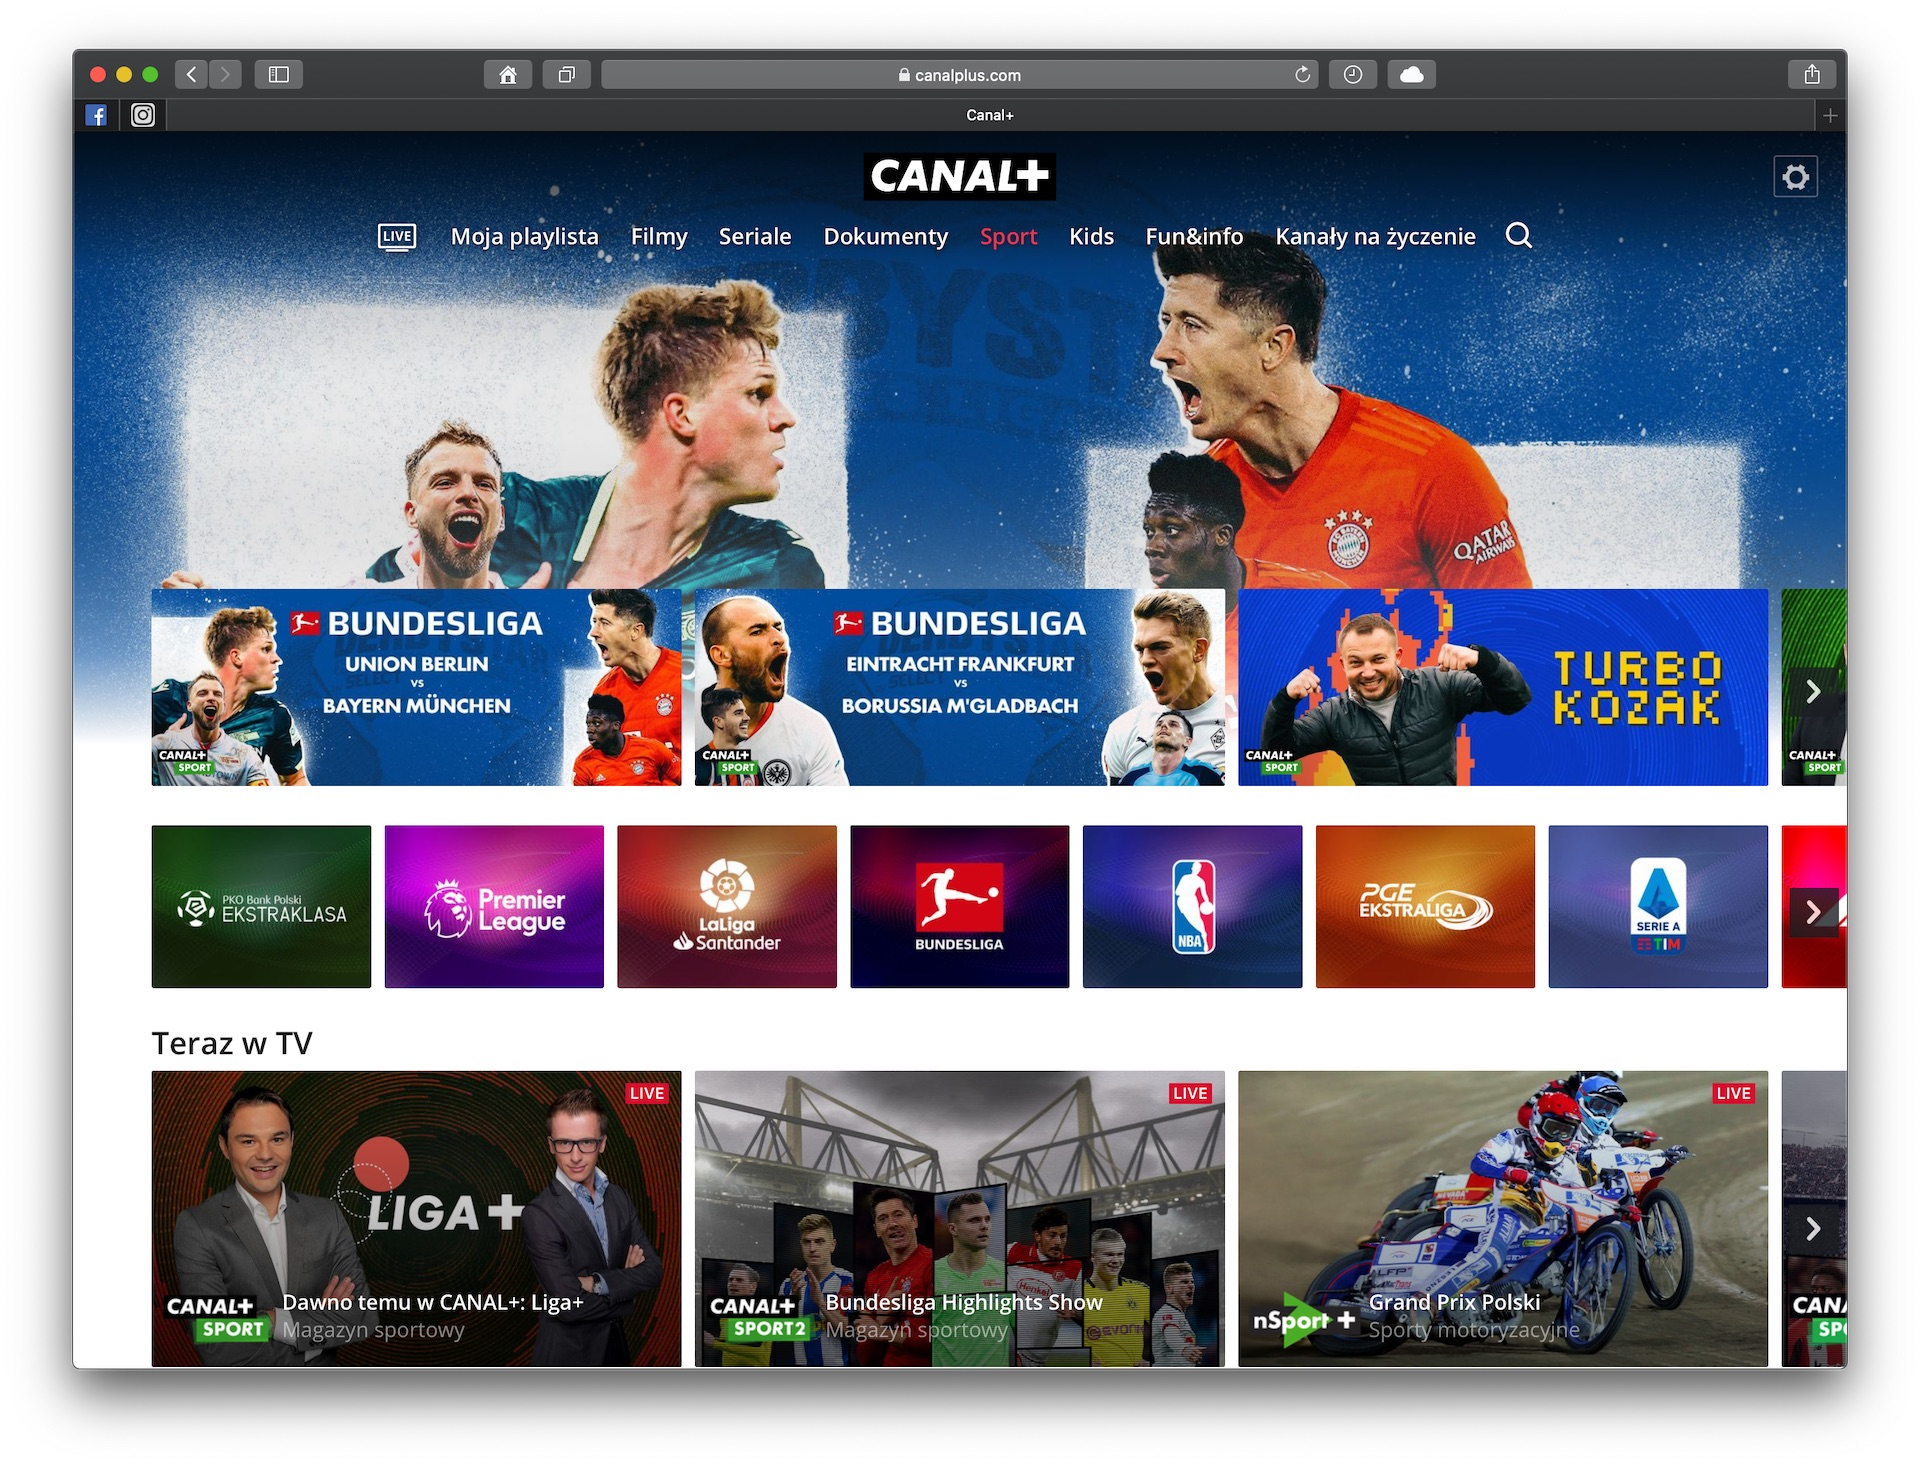 vod canal plus telewizja przez internet screenshot safari web